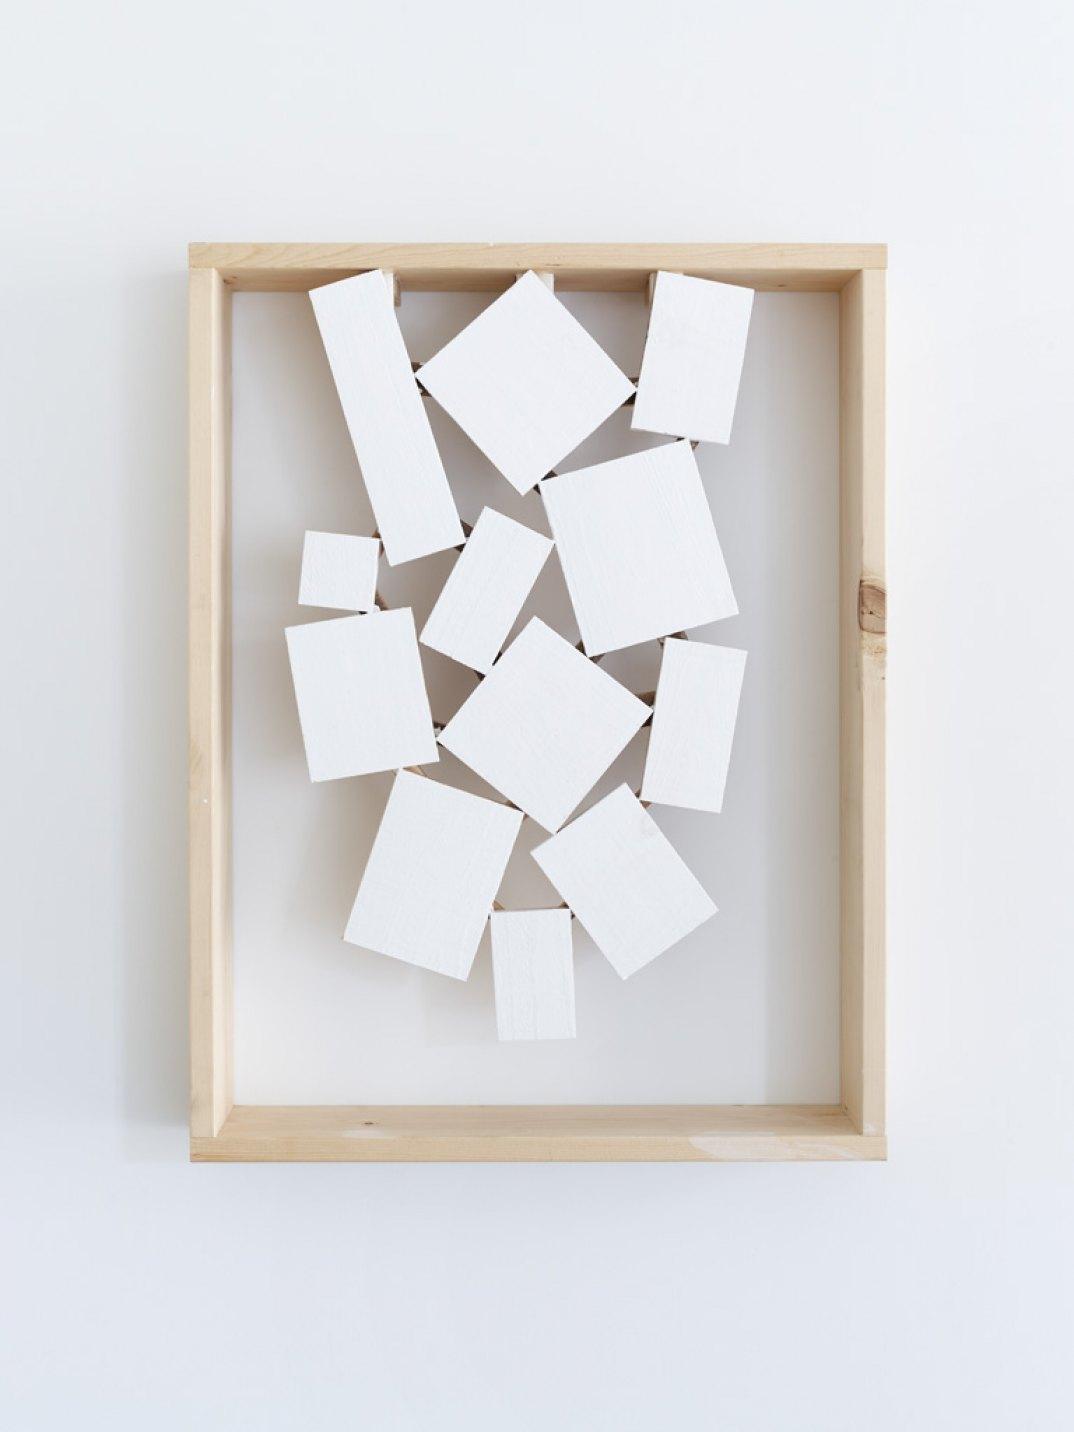 Kishio Suga,<em>Rising Spatialization</em>, 2017, wood, paint, 67 × 51 × 9 cm - Mendes Wood DM